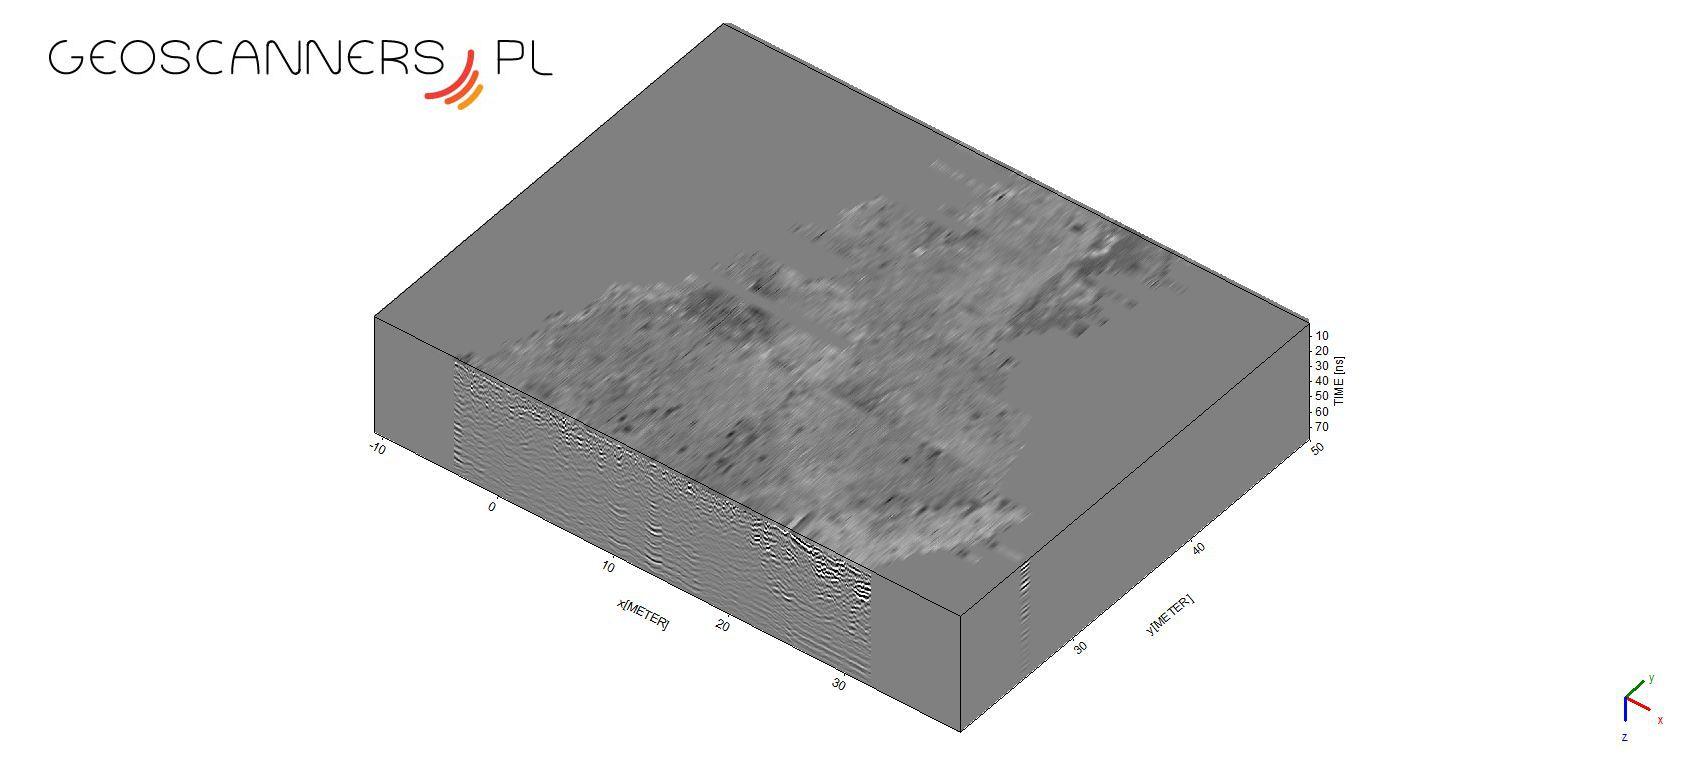 GPR 3D imaging